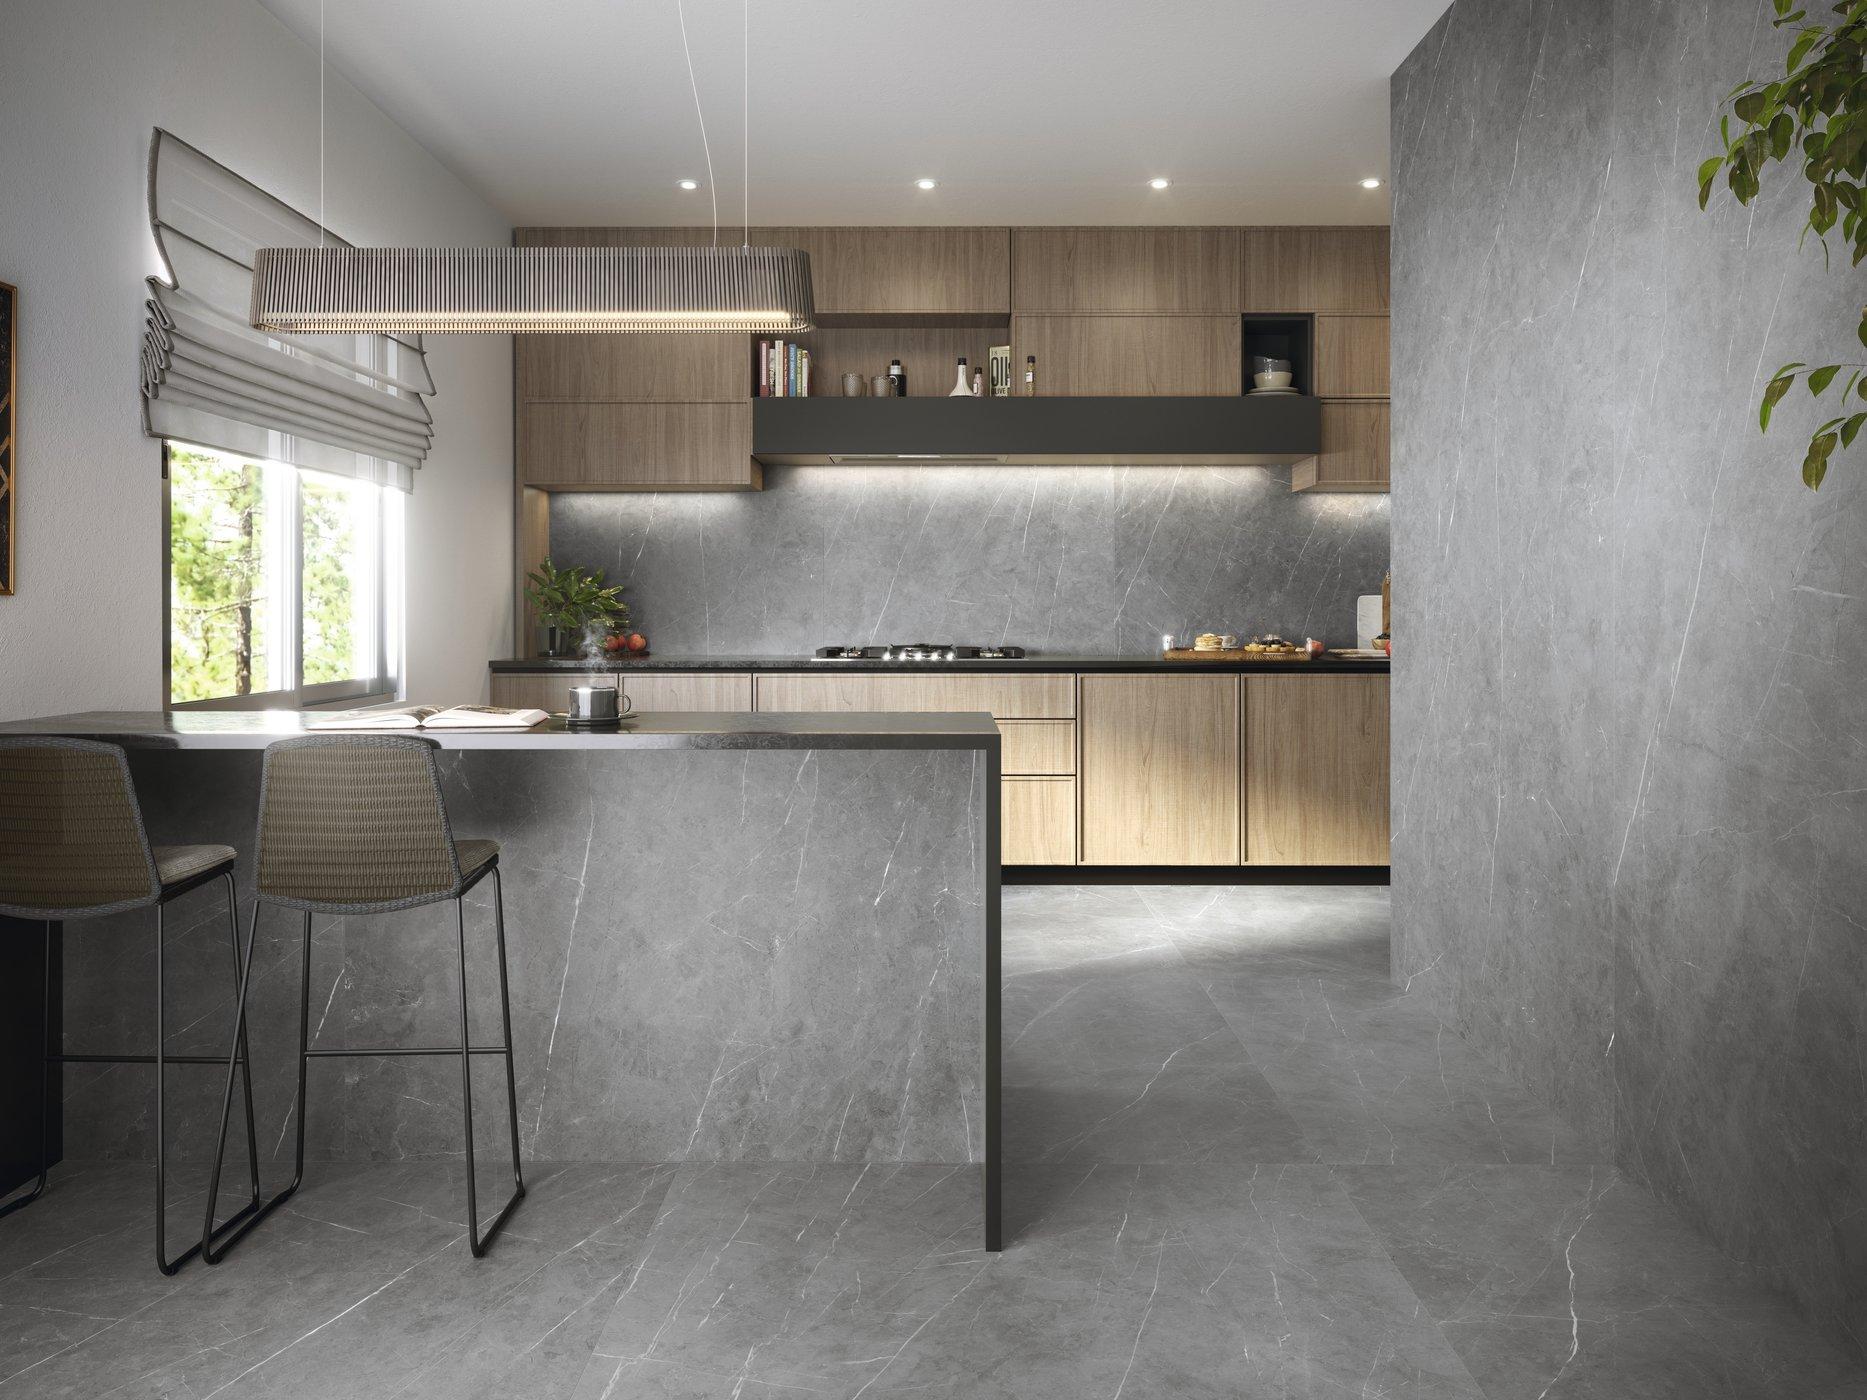 Tessino Grey Natural 260 x 120 cm. Pavimento Tessino Grey Natural 120 x 120 cm.